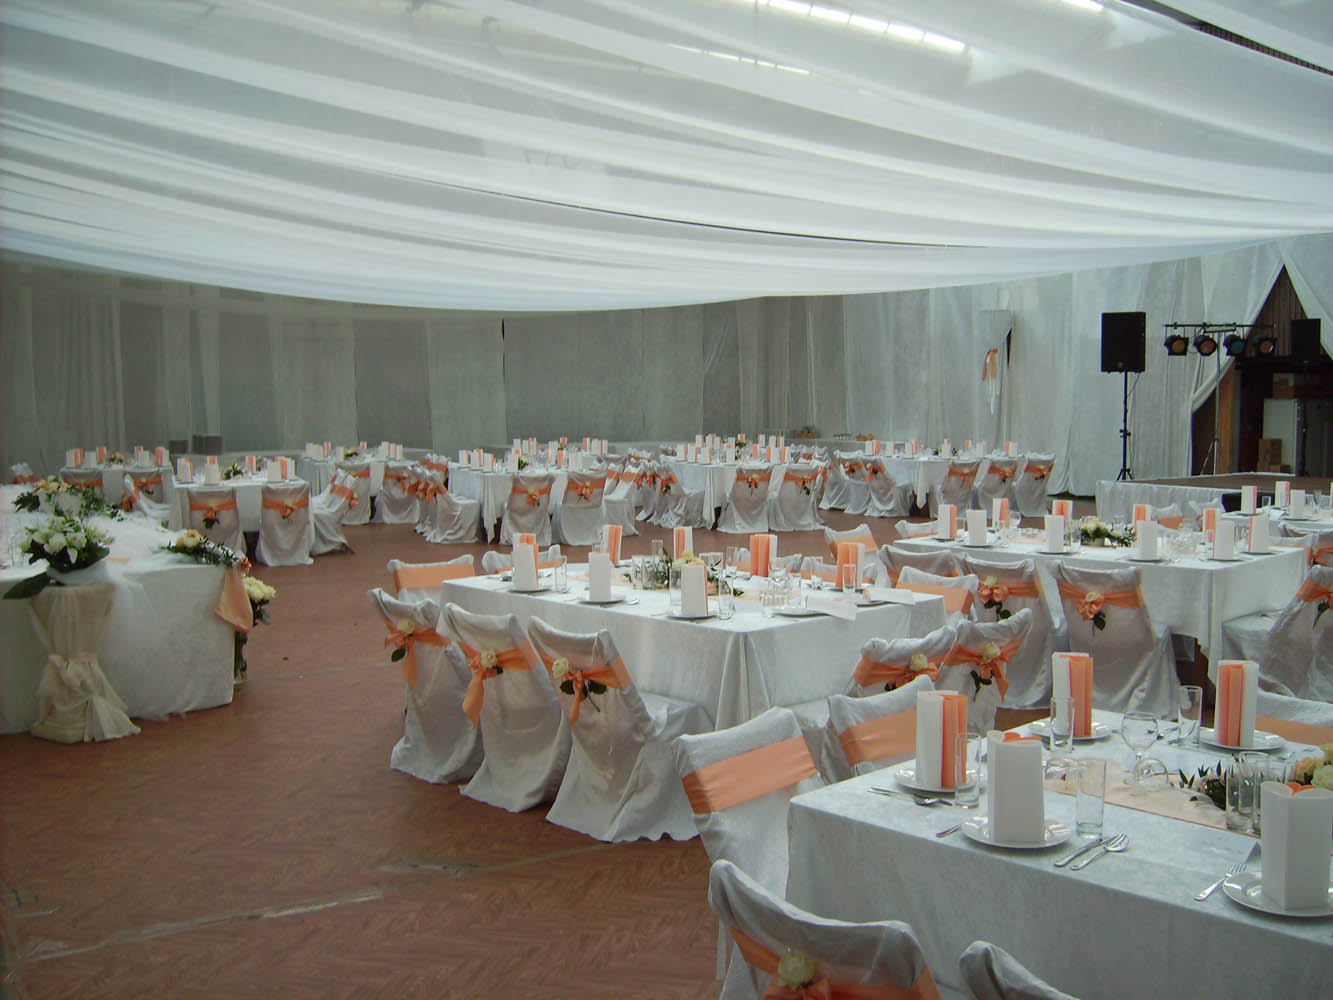 Catering Hochzeit Nürnberg durch Grillmeister Pausch